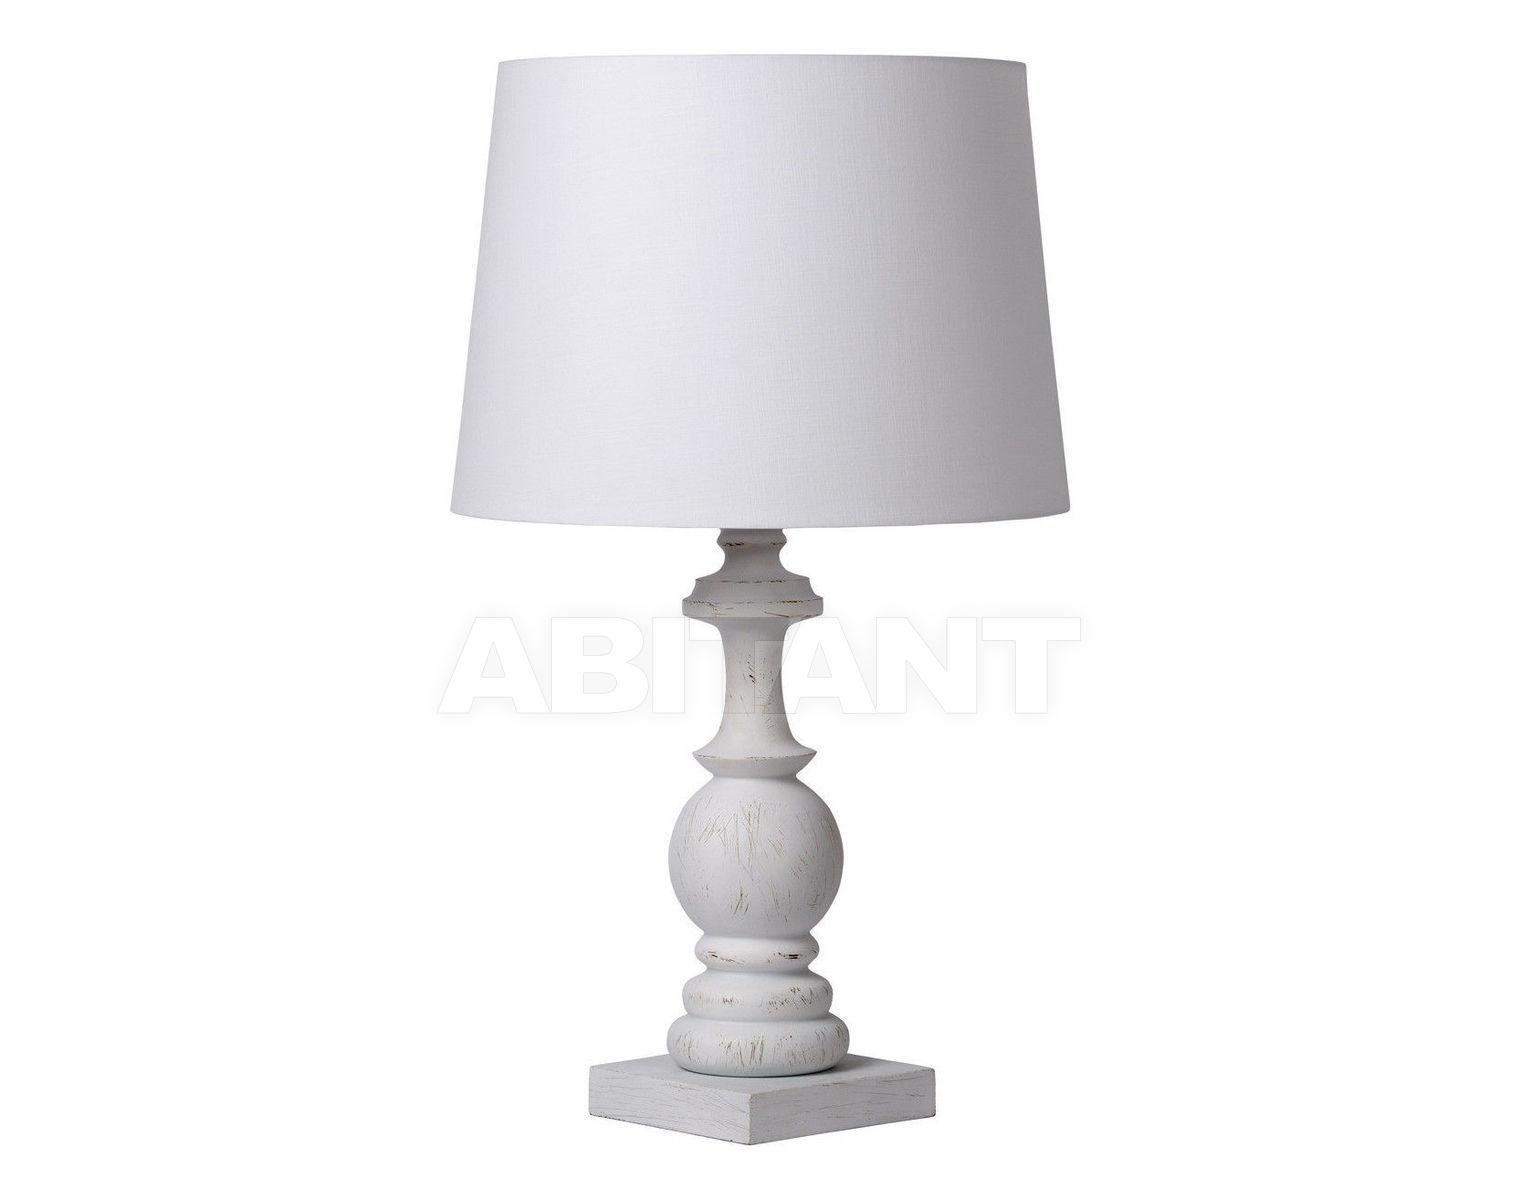 Купить Лампа настольная JOCO Lucide  Table And Floorlamps 17541/50/21